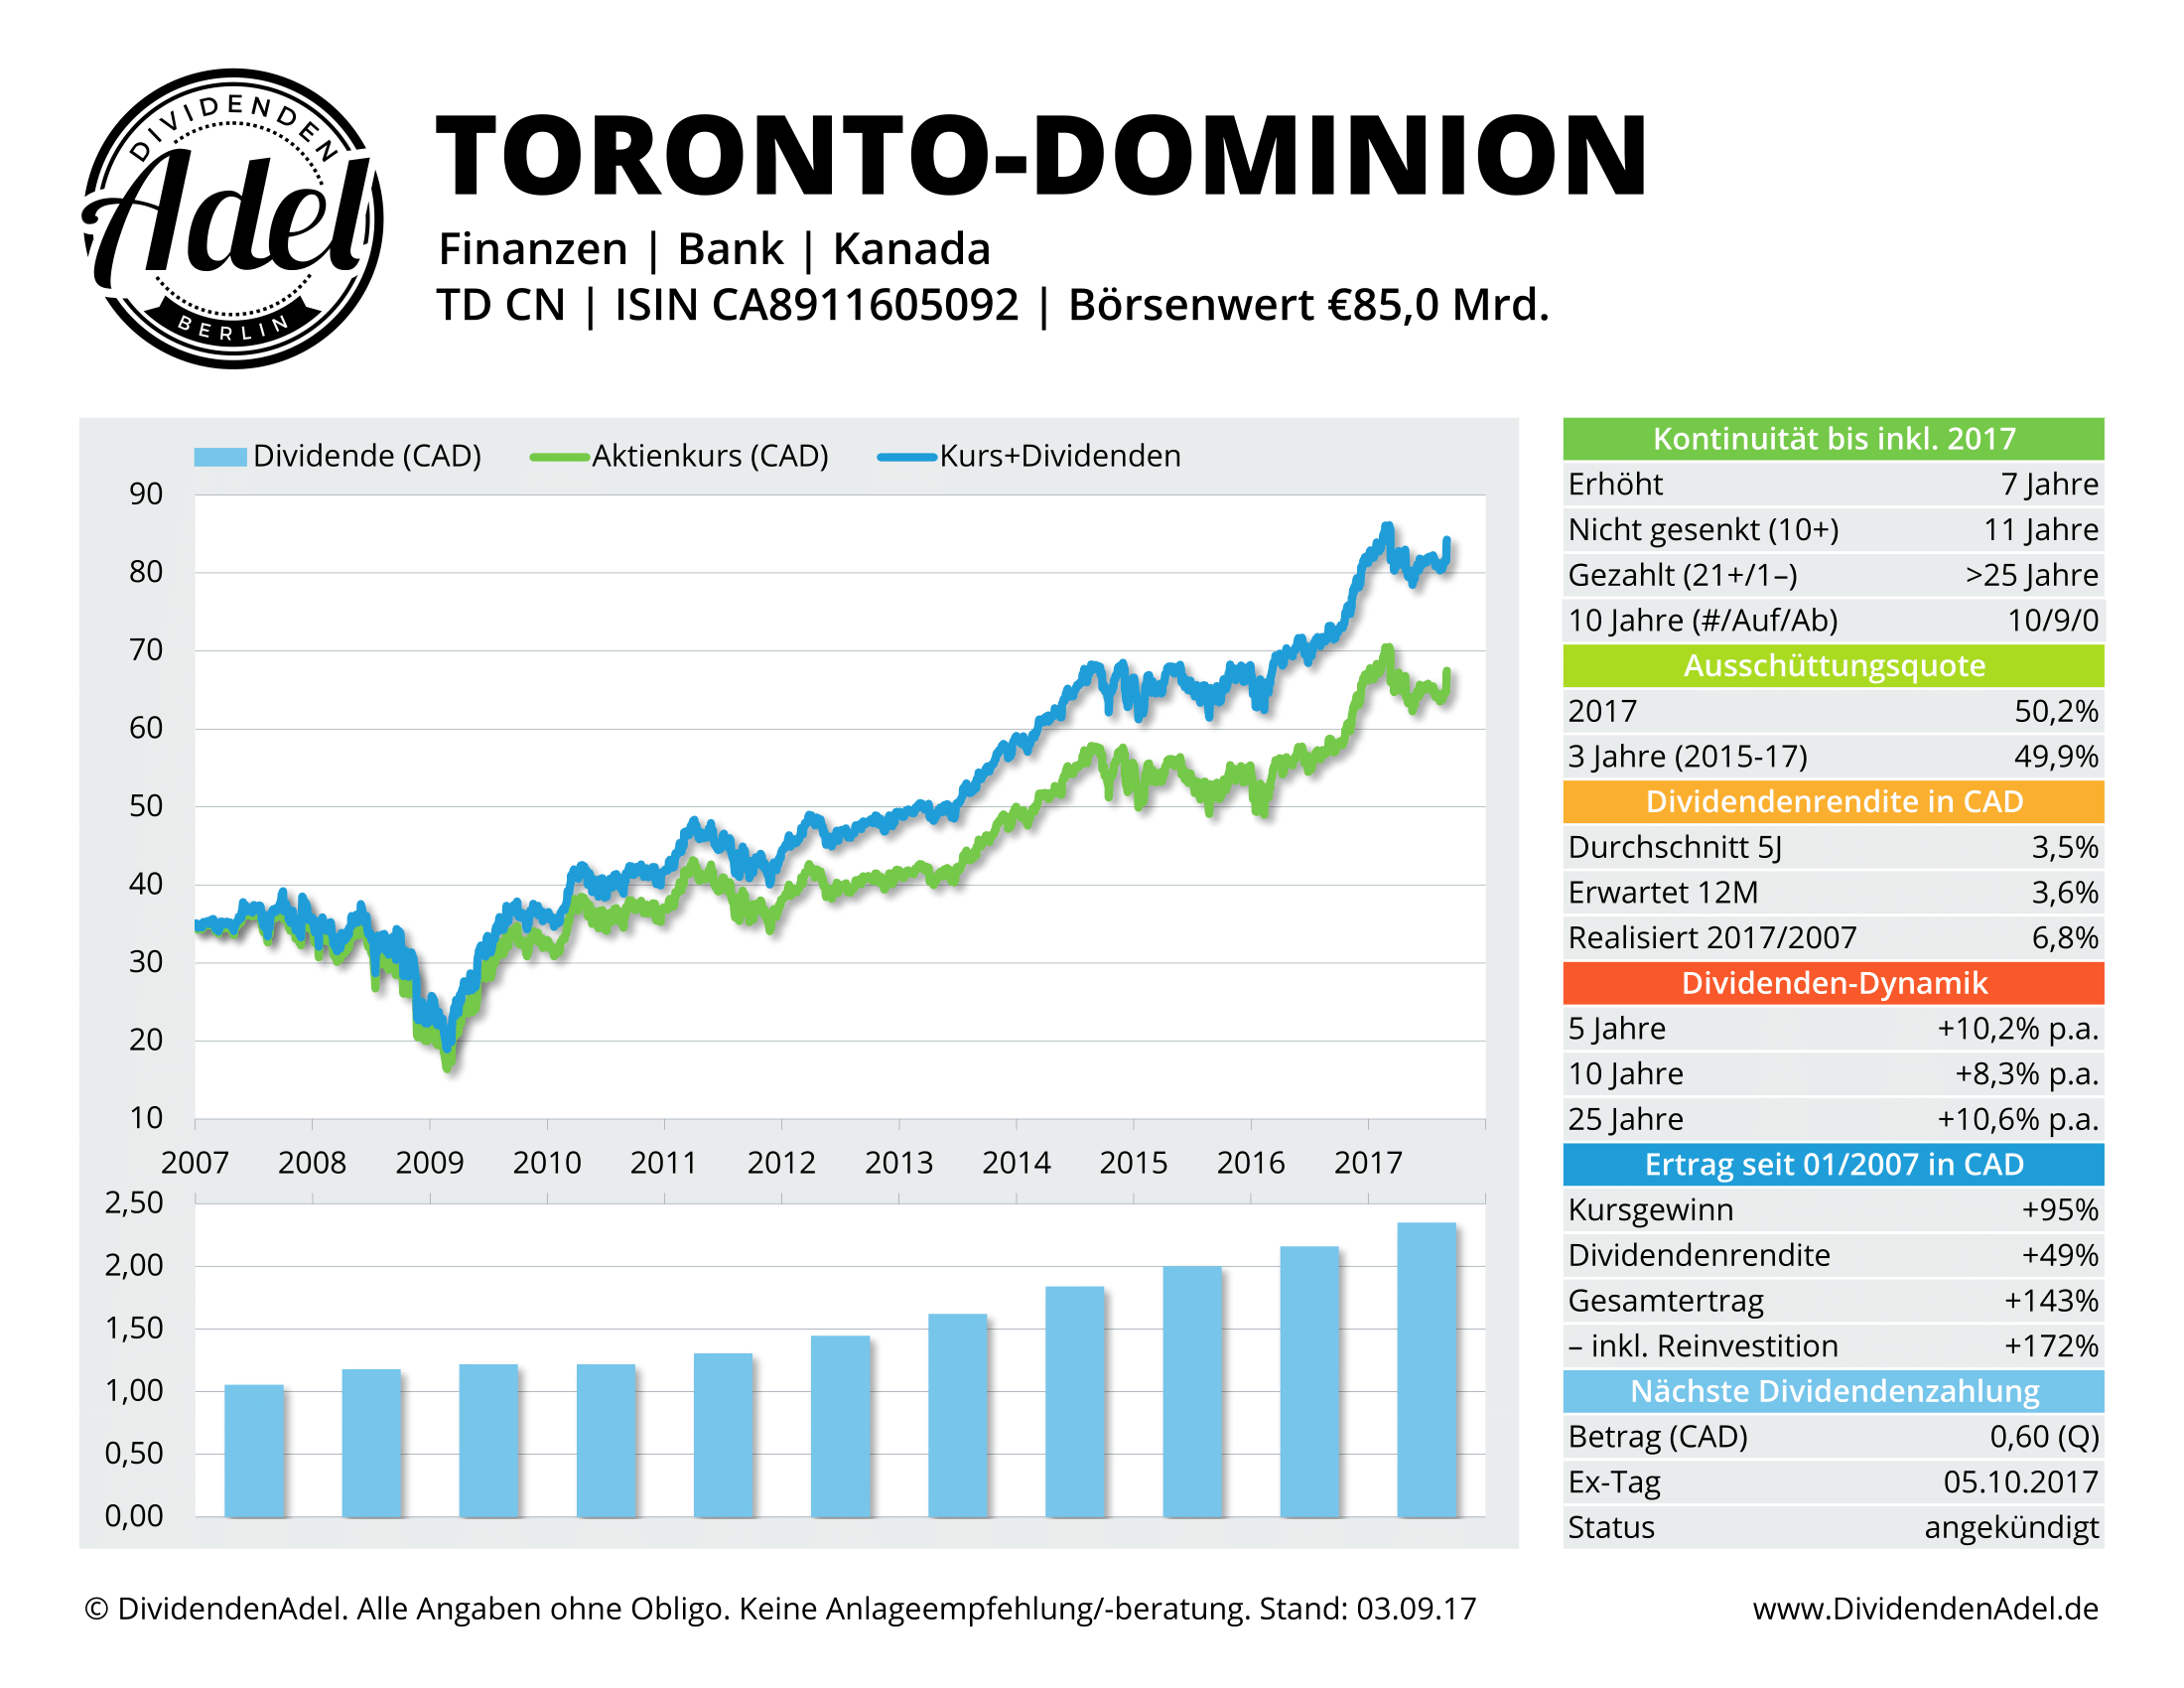 TORONTO-DOMINION-DividendenAdel-Profil